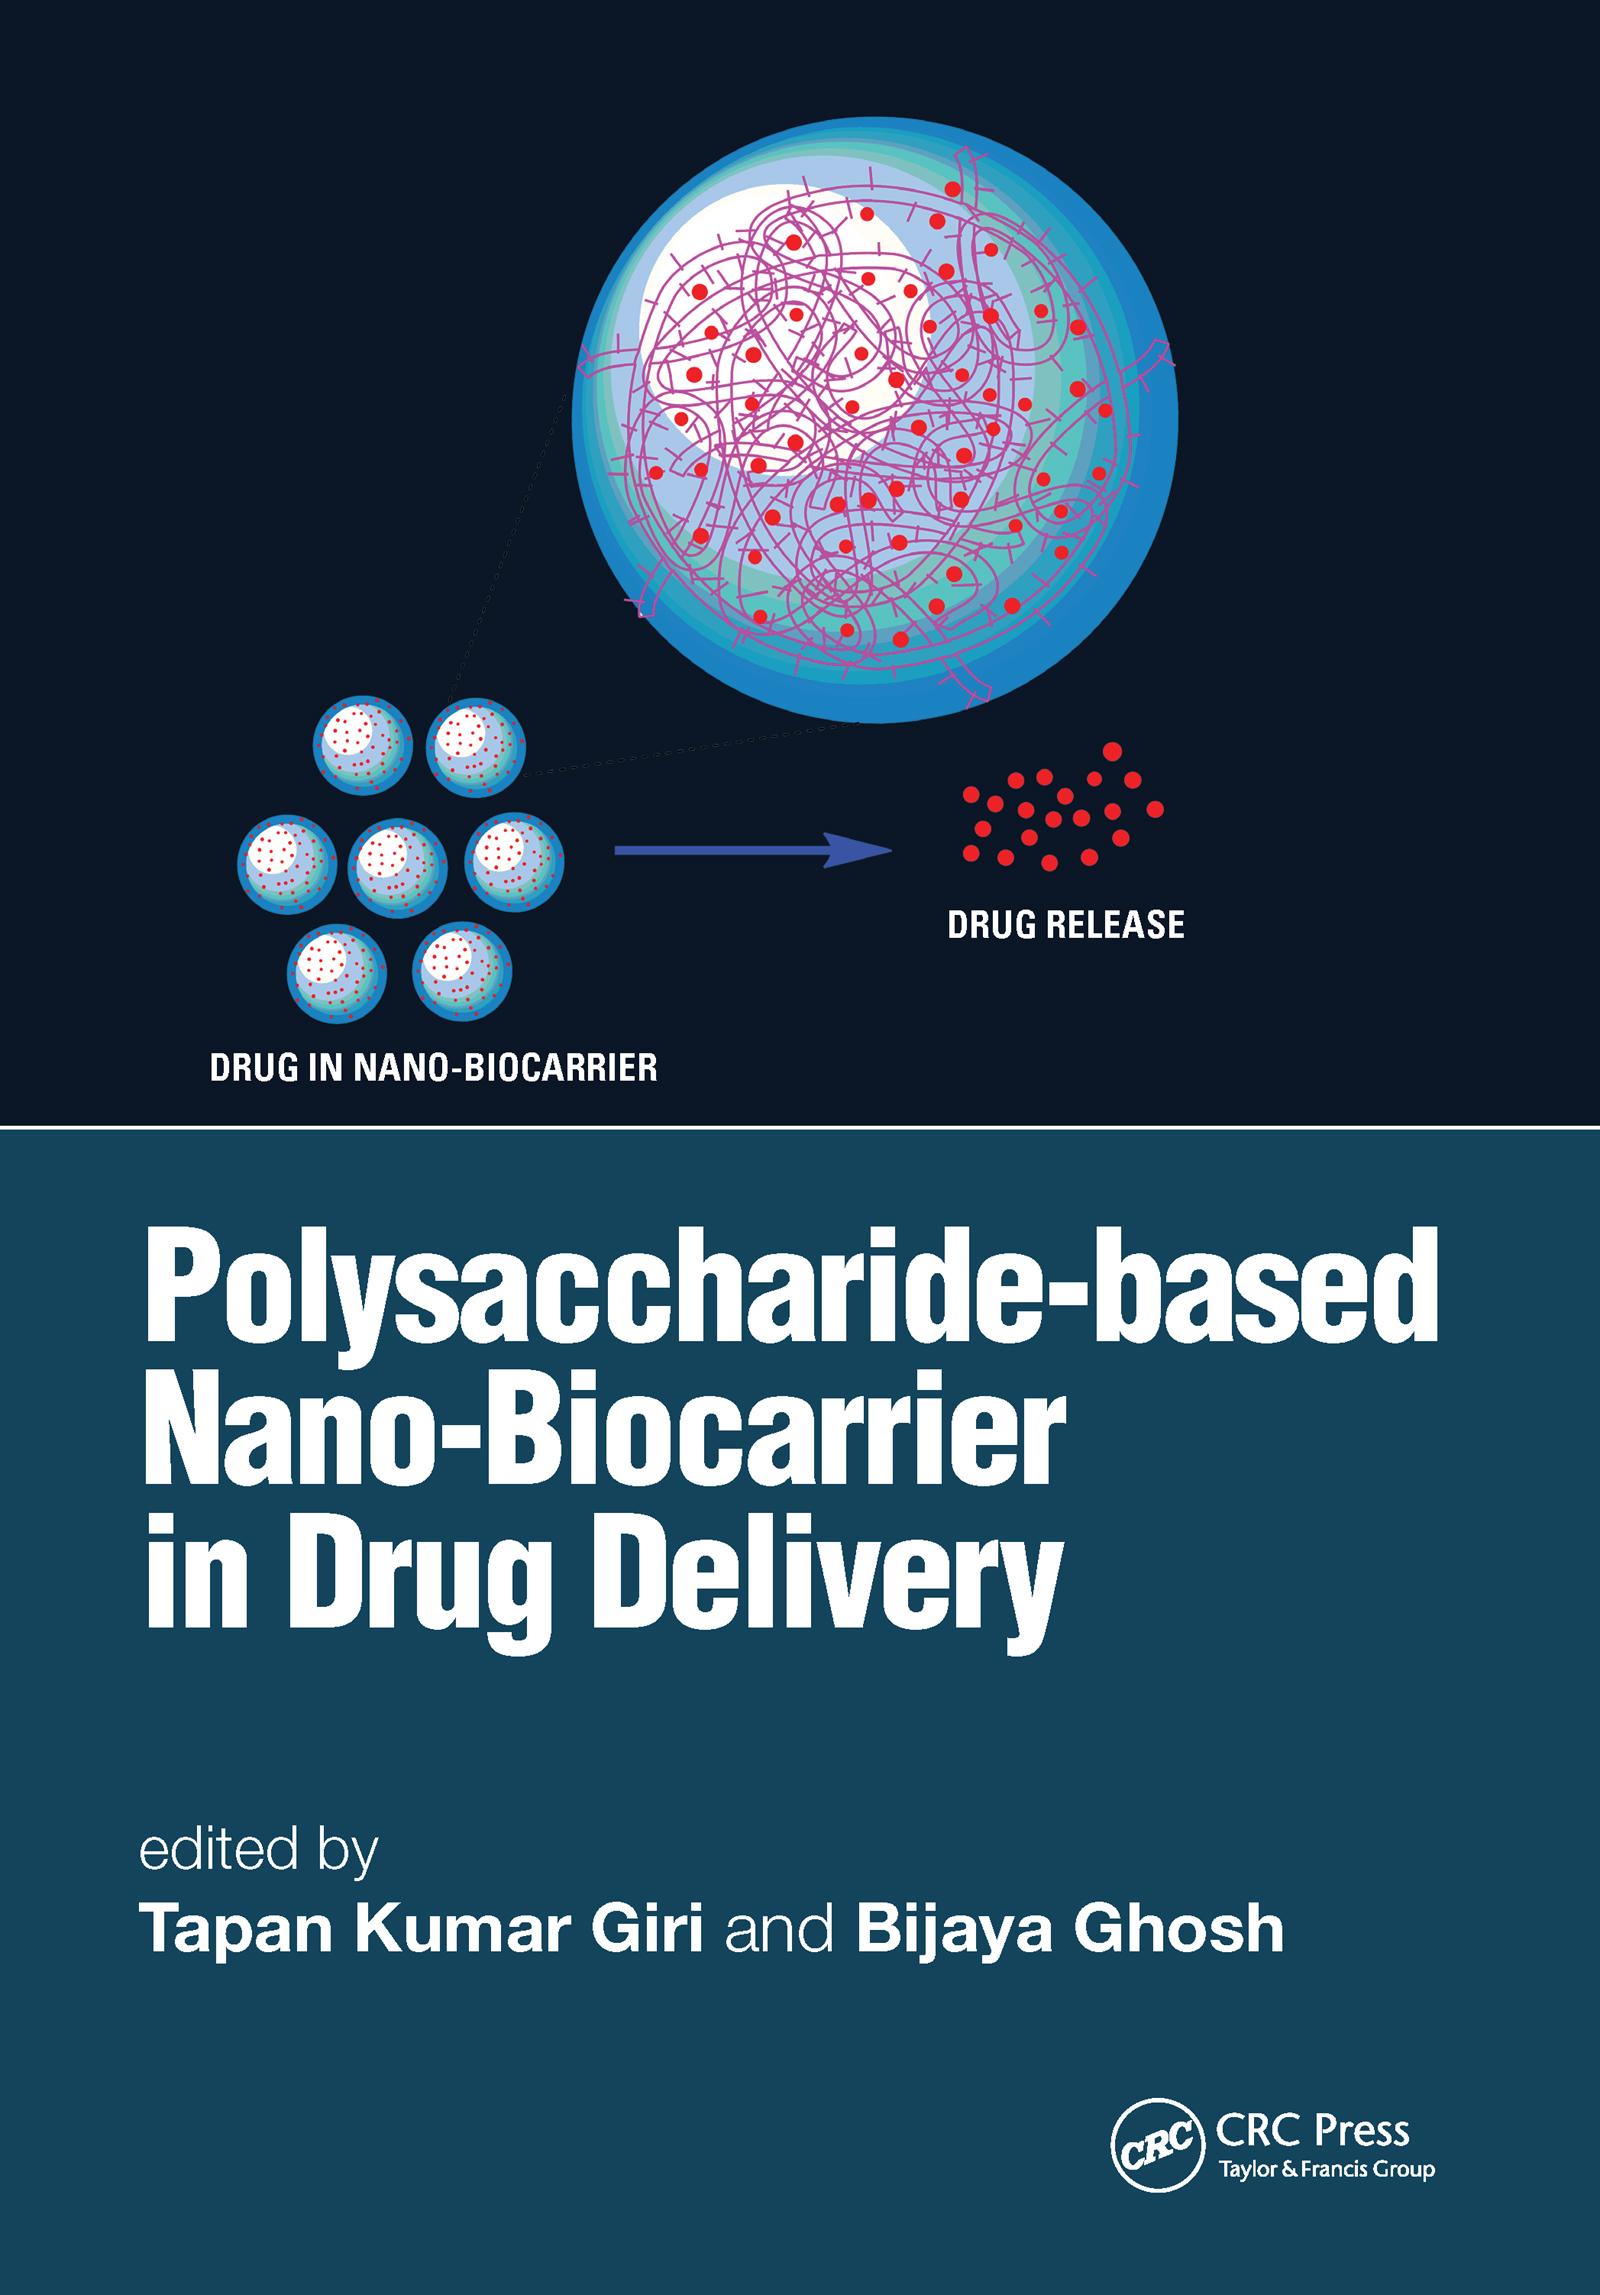 Polysaccharide based Nano-Biocarrier in Drug Delivery